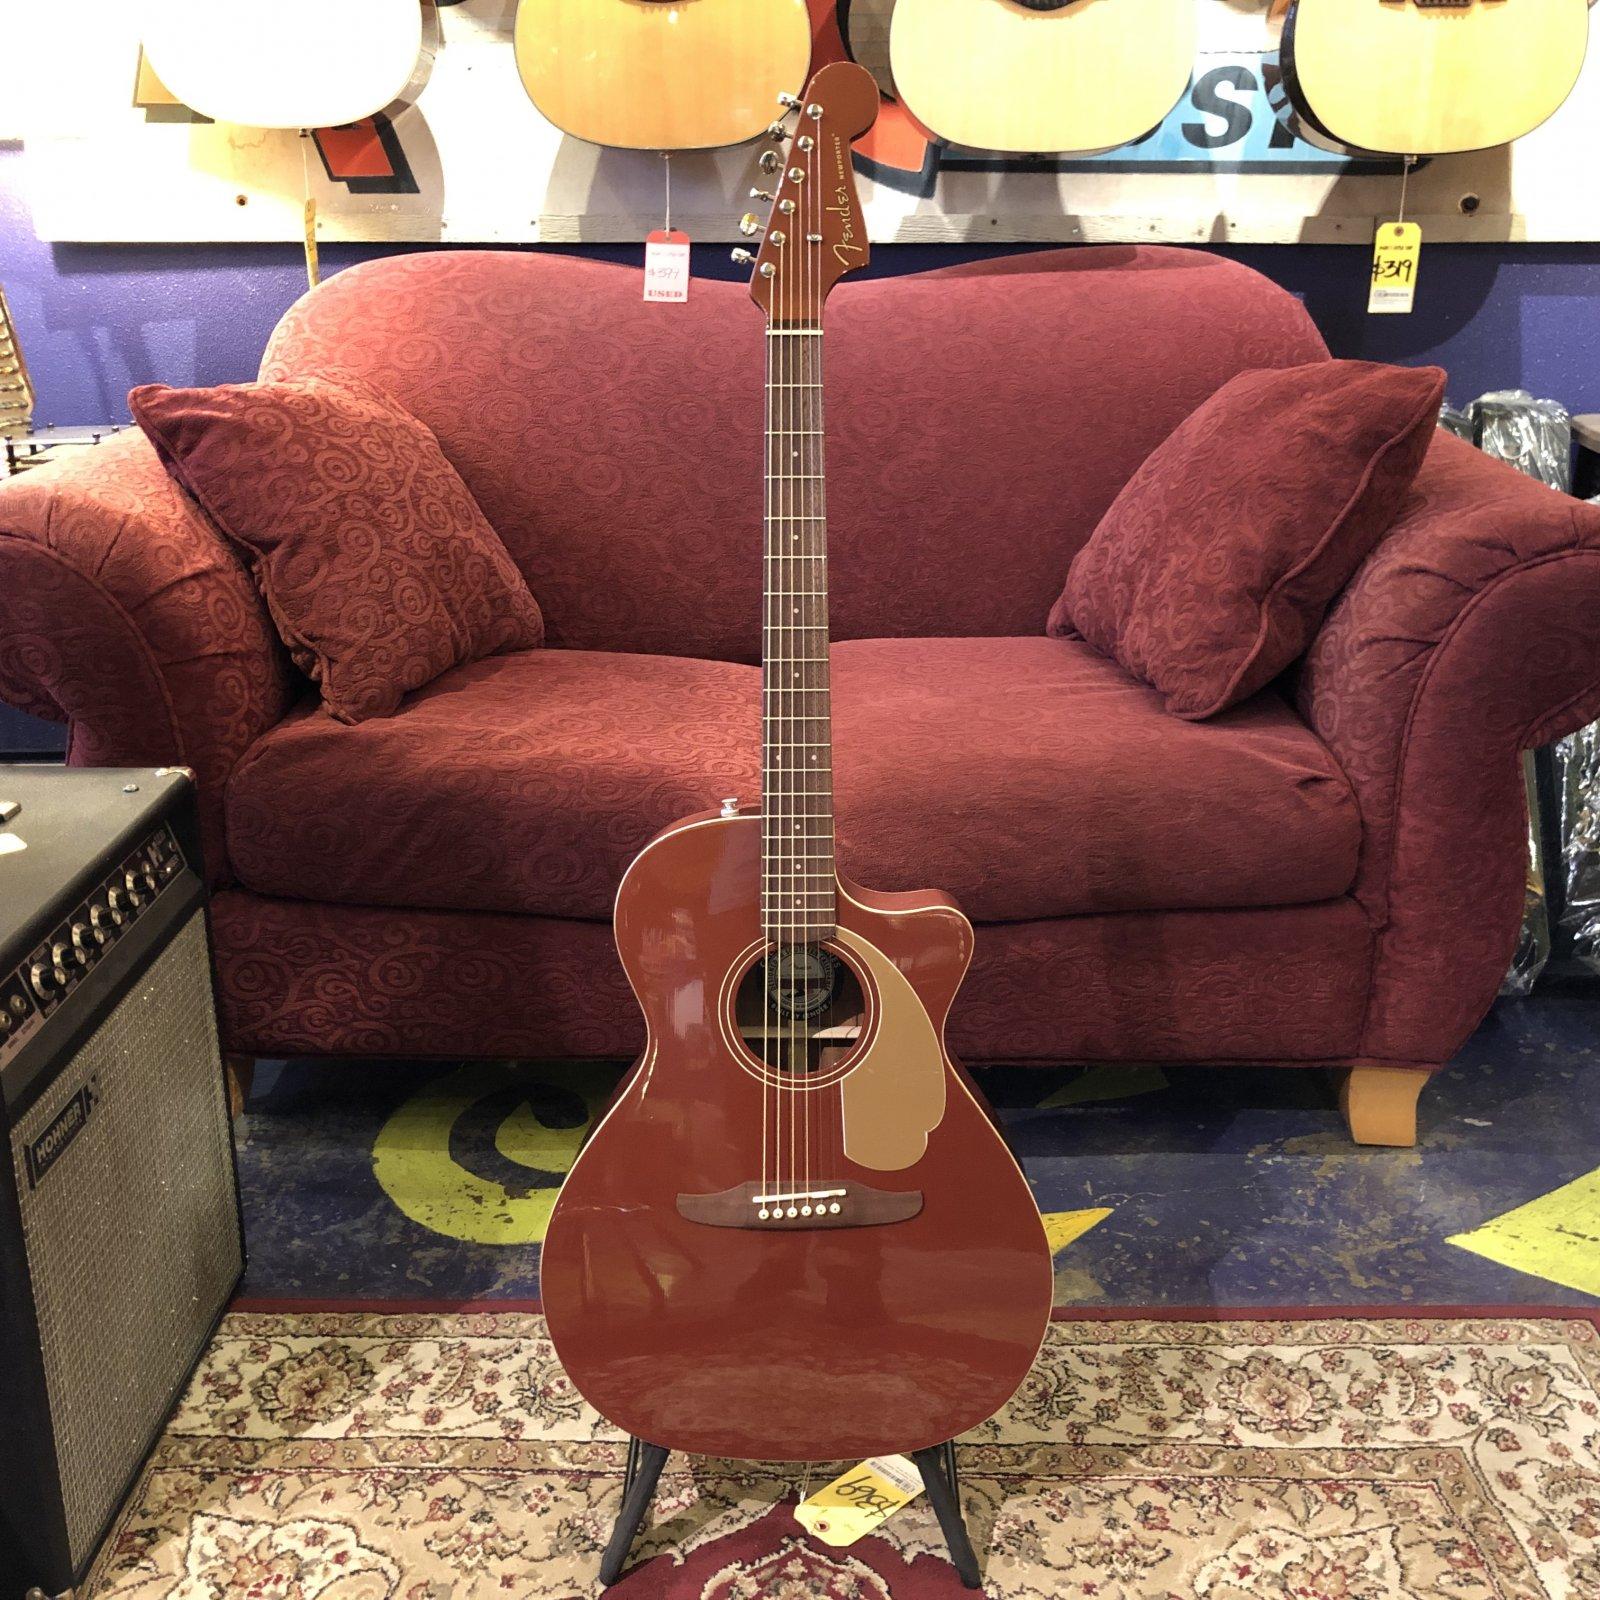 Fender Newporter Special - California Series Acoustic